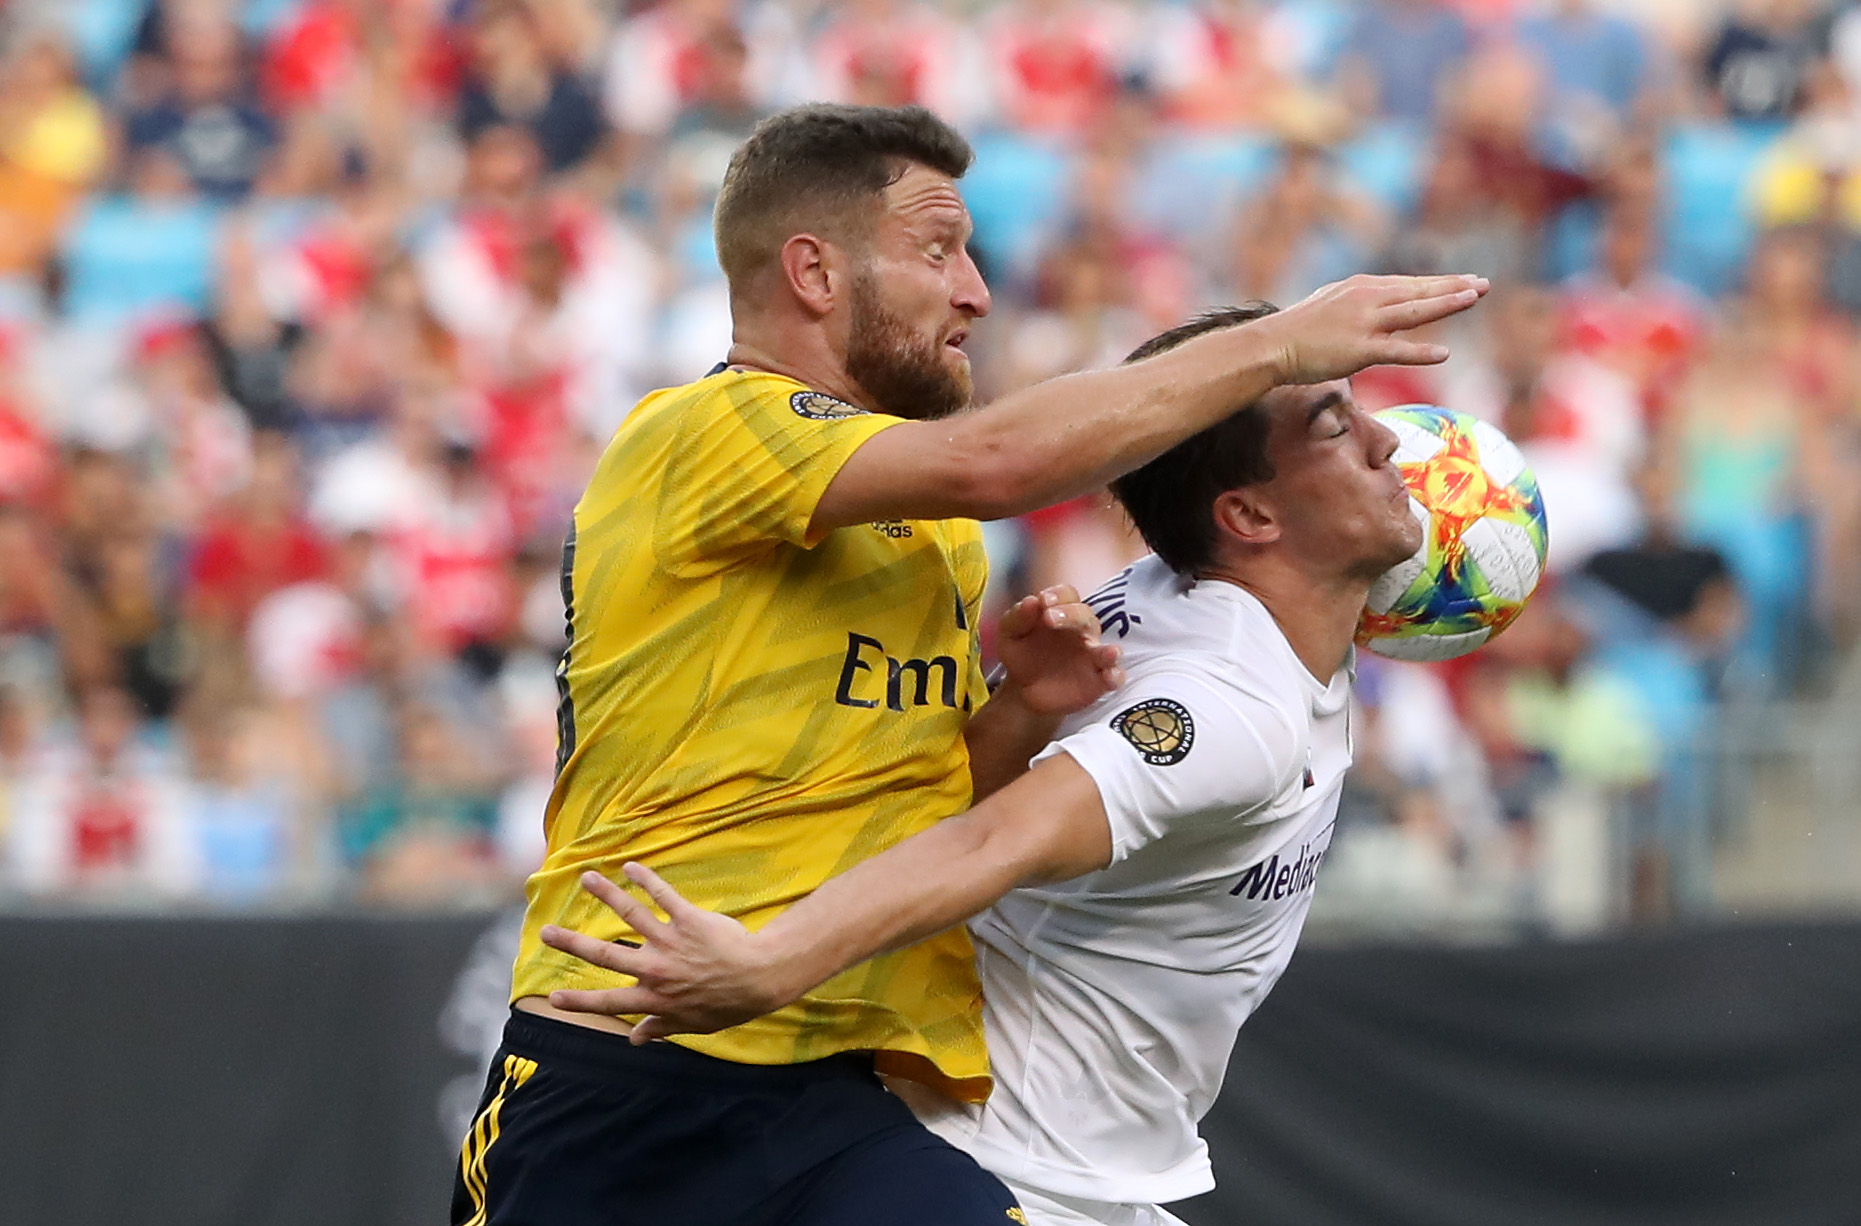 Arsenal v ACF Fiorentina - 2019 International Champions Cup